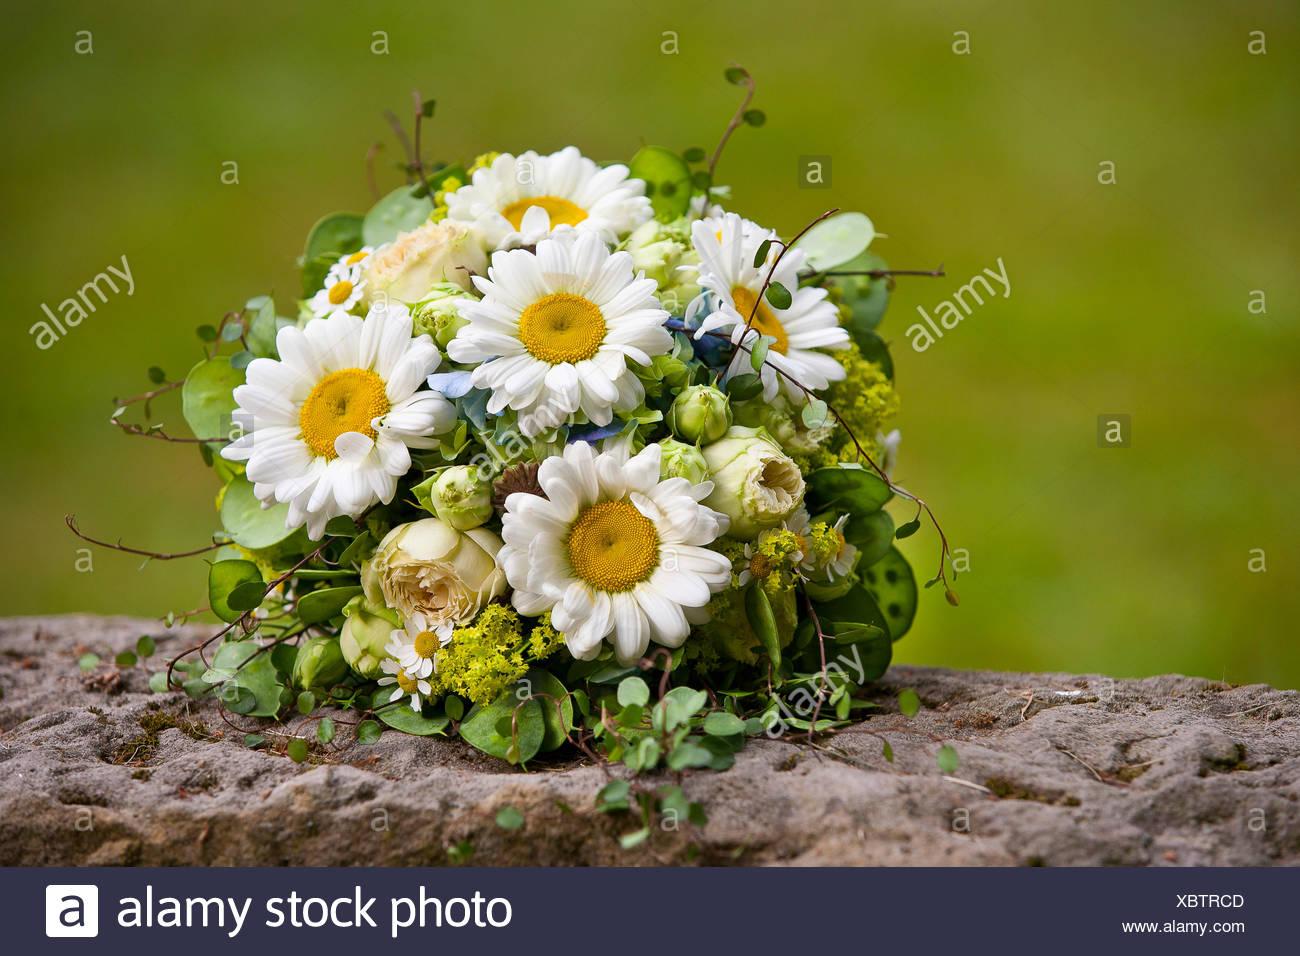 Brautstrauss Mit Ganseblumchen Stockfoto Bild 282672333 Alamy